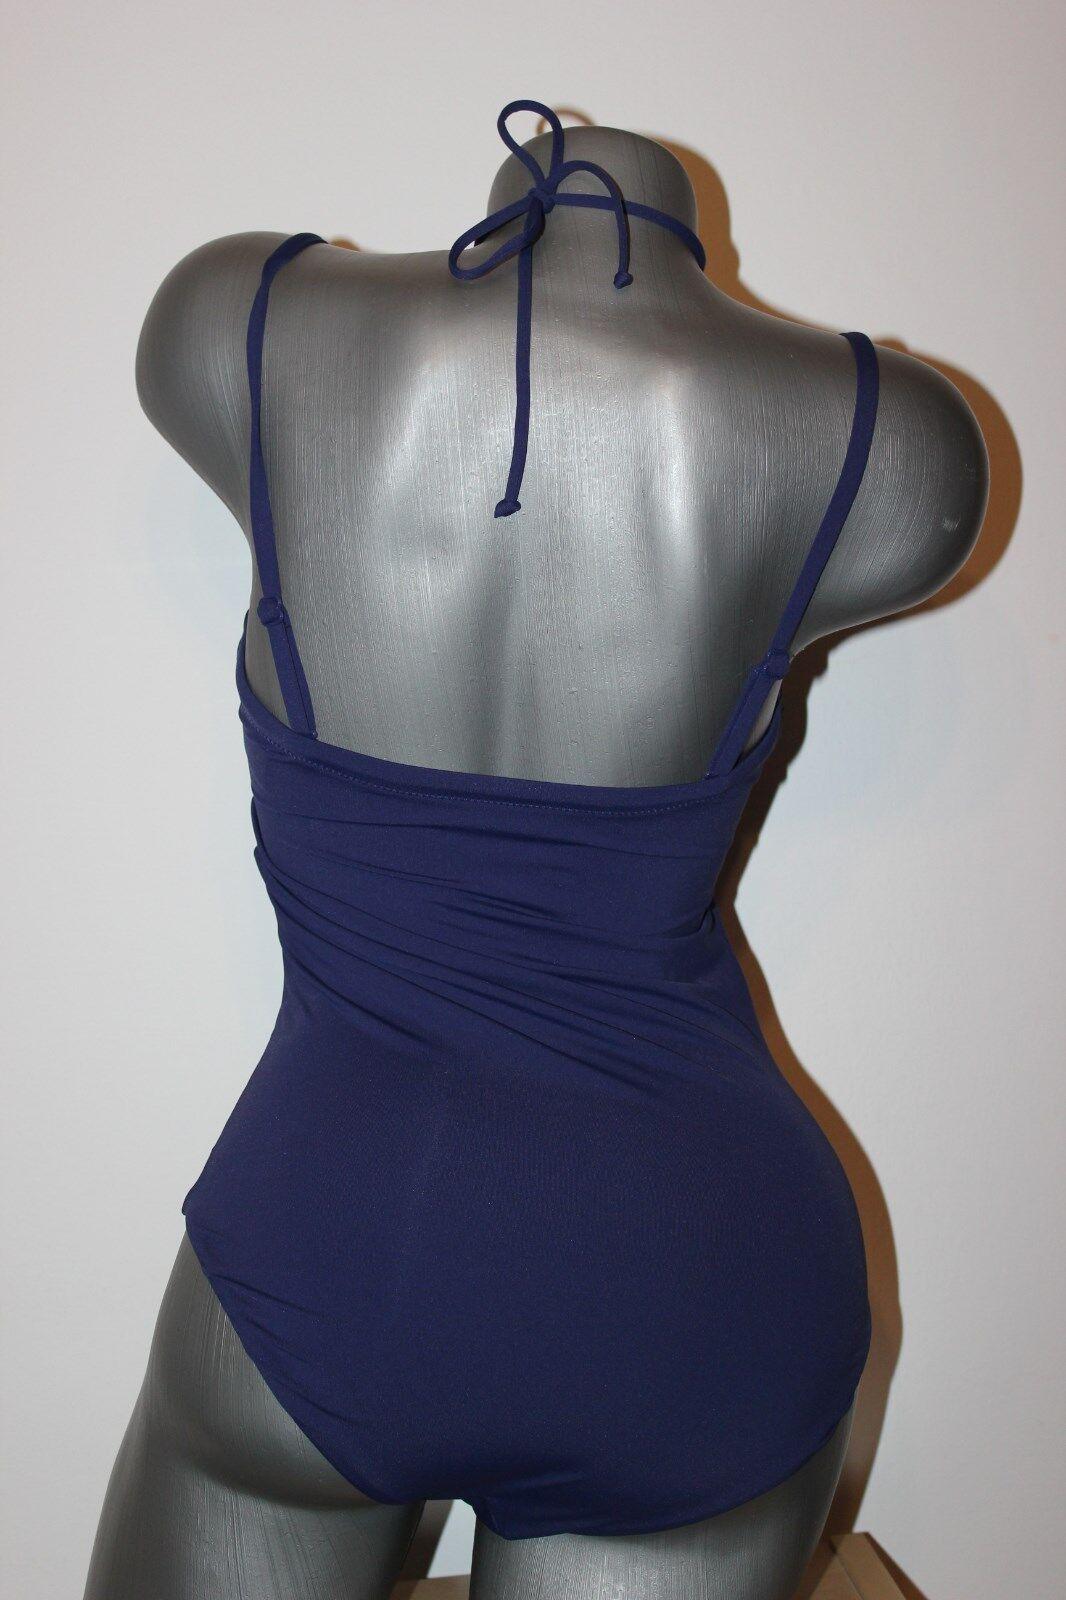 TRIUMPH gefütterter Costume da bagno Venus Venus Venus Elegance 17 OPD SD tg. 38 B blu con allacciatura al collo 802b9f